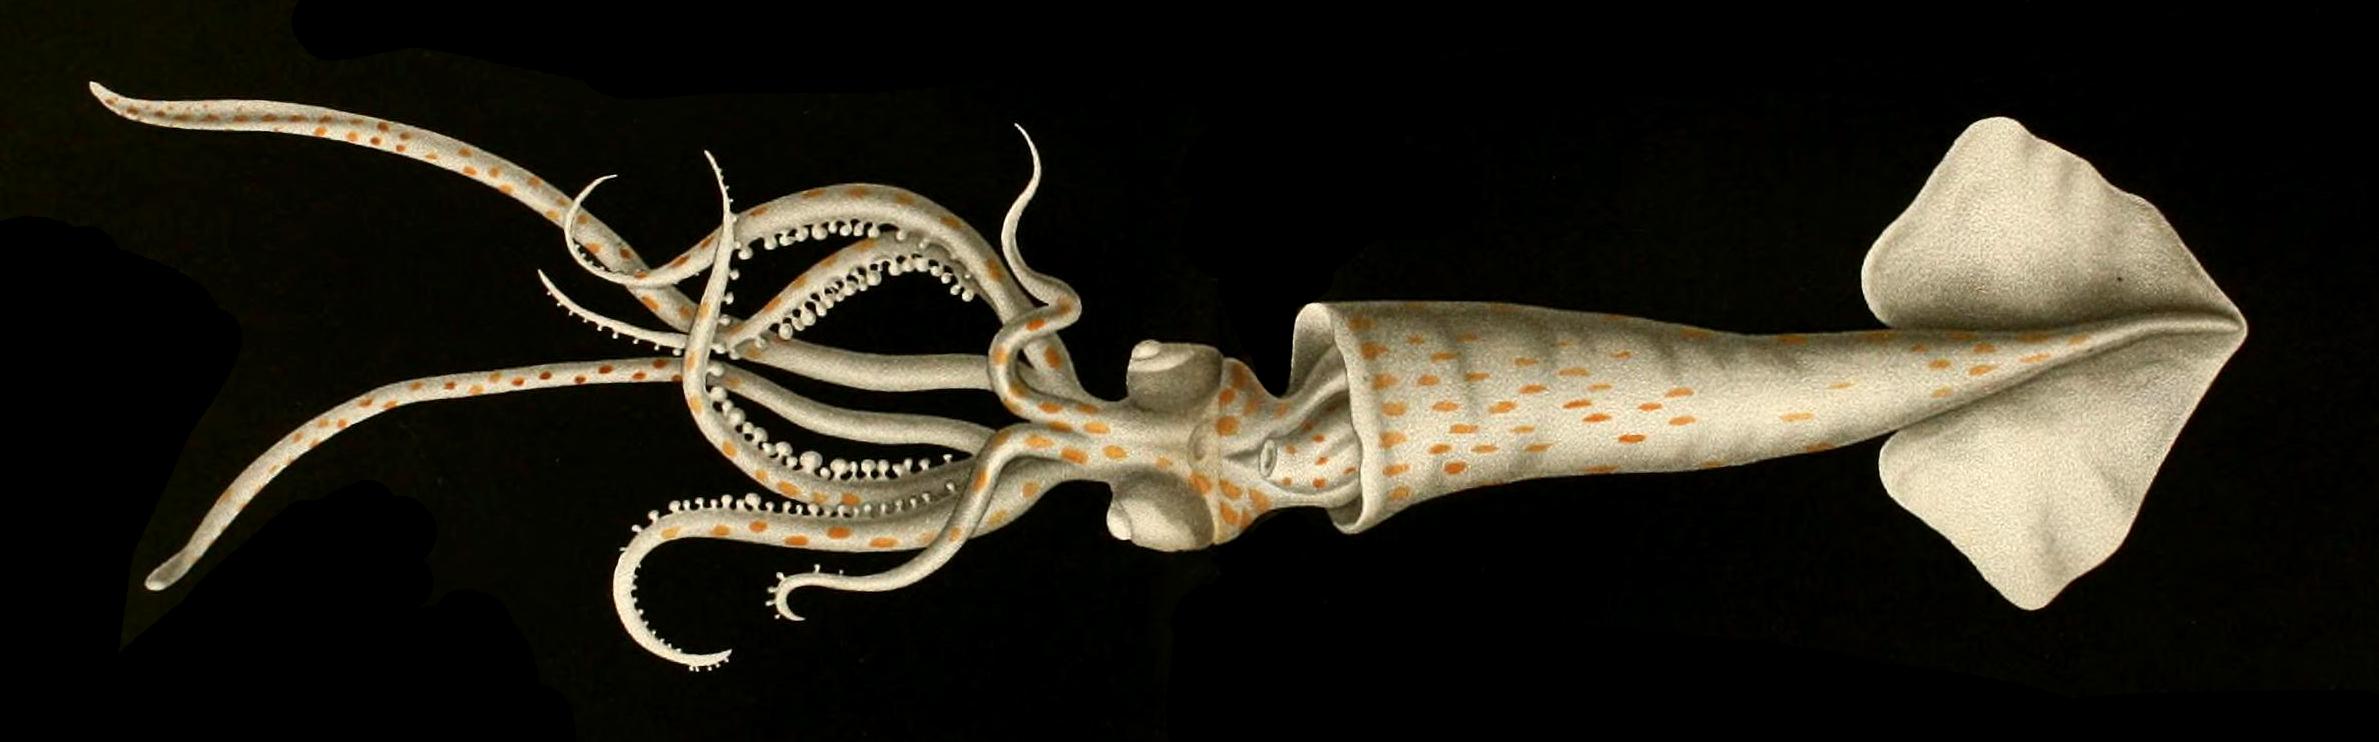 Image of common arm squid